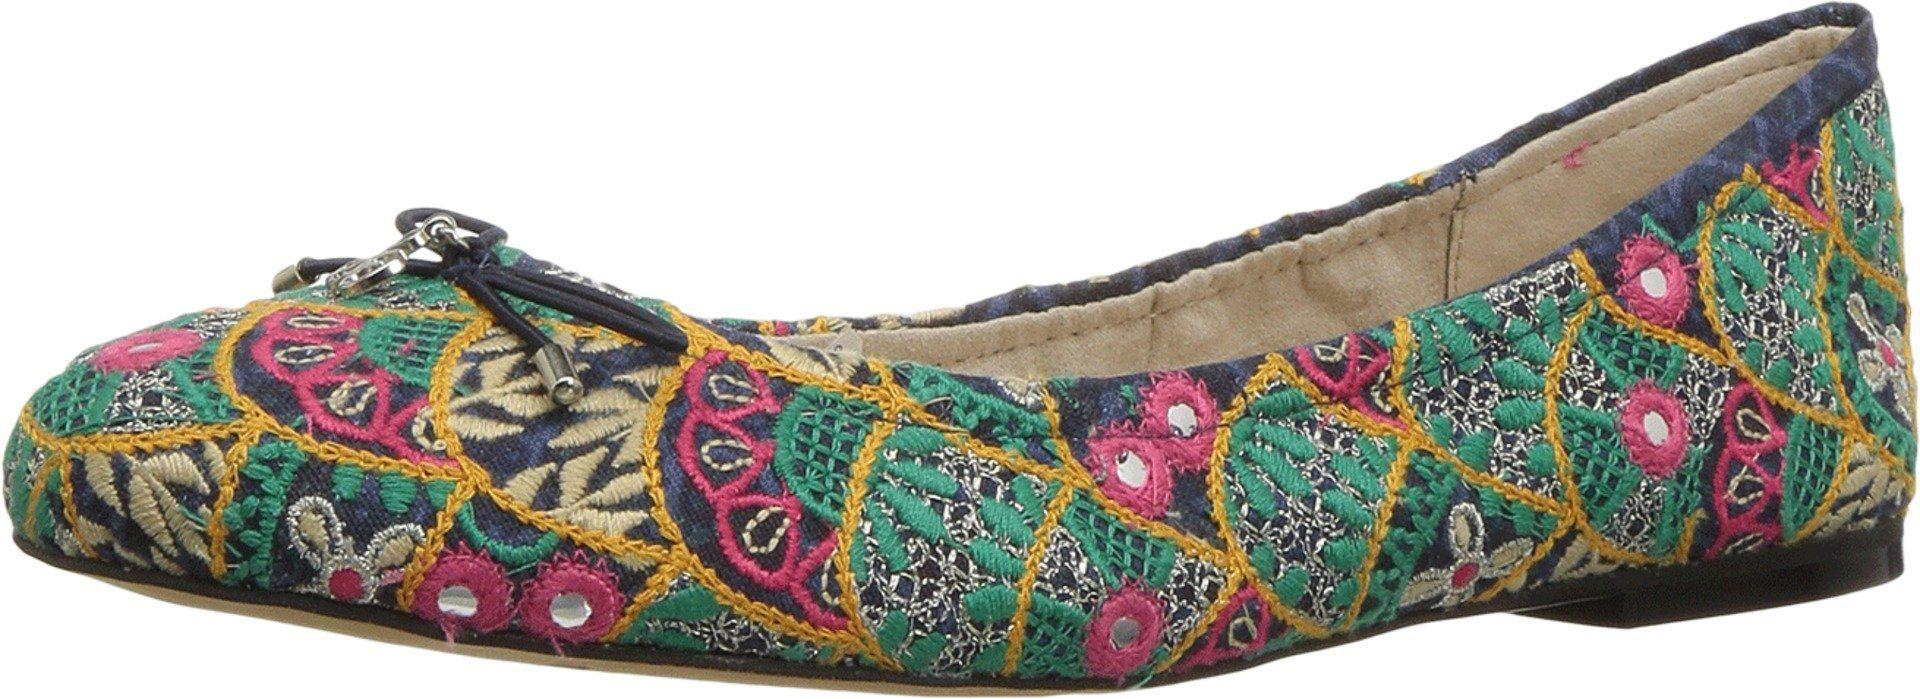 Sam edelman womenus felicia indigo multi ibiza embroidery fabric